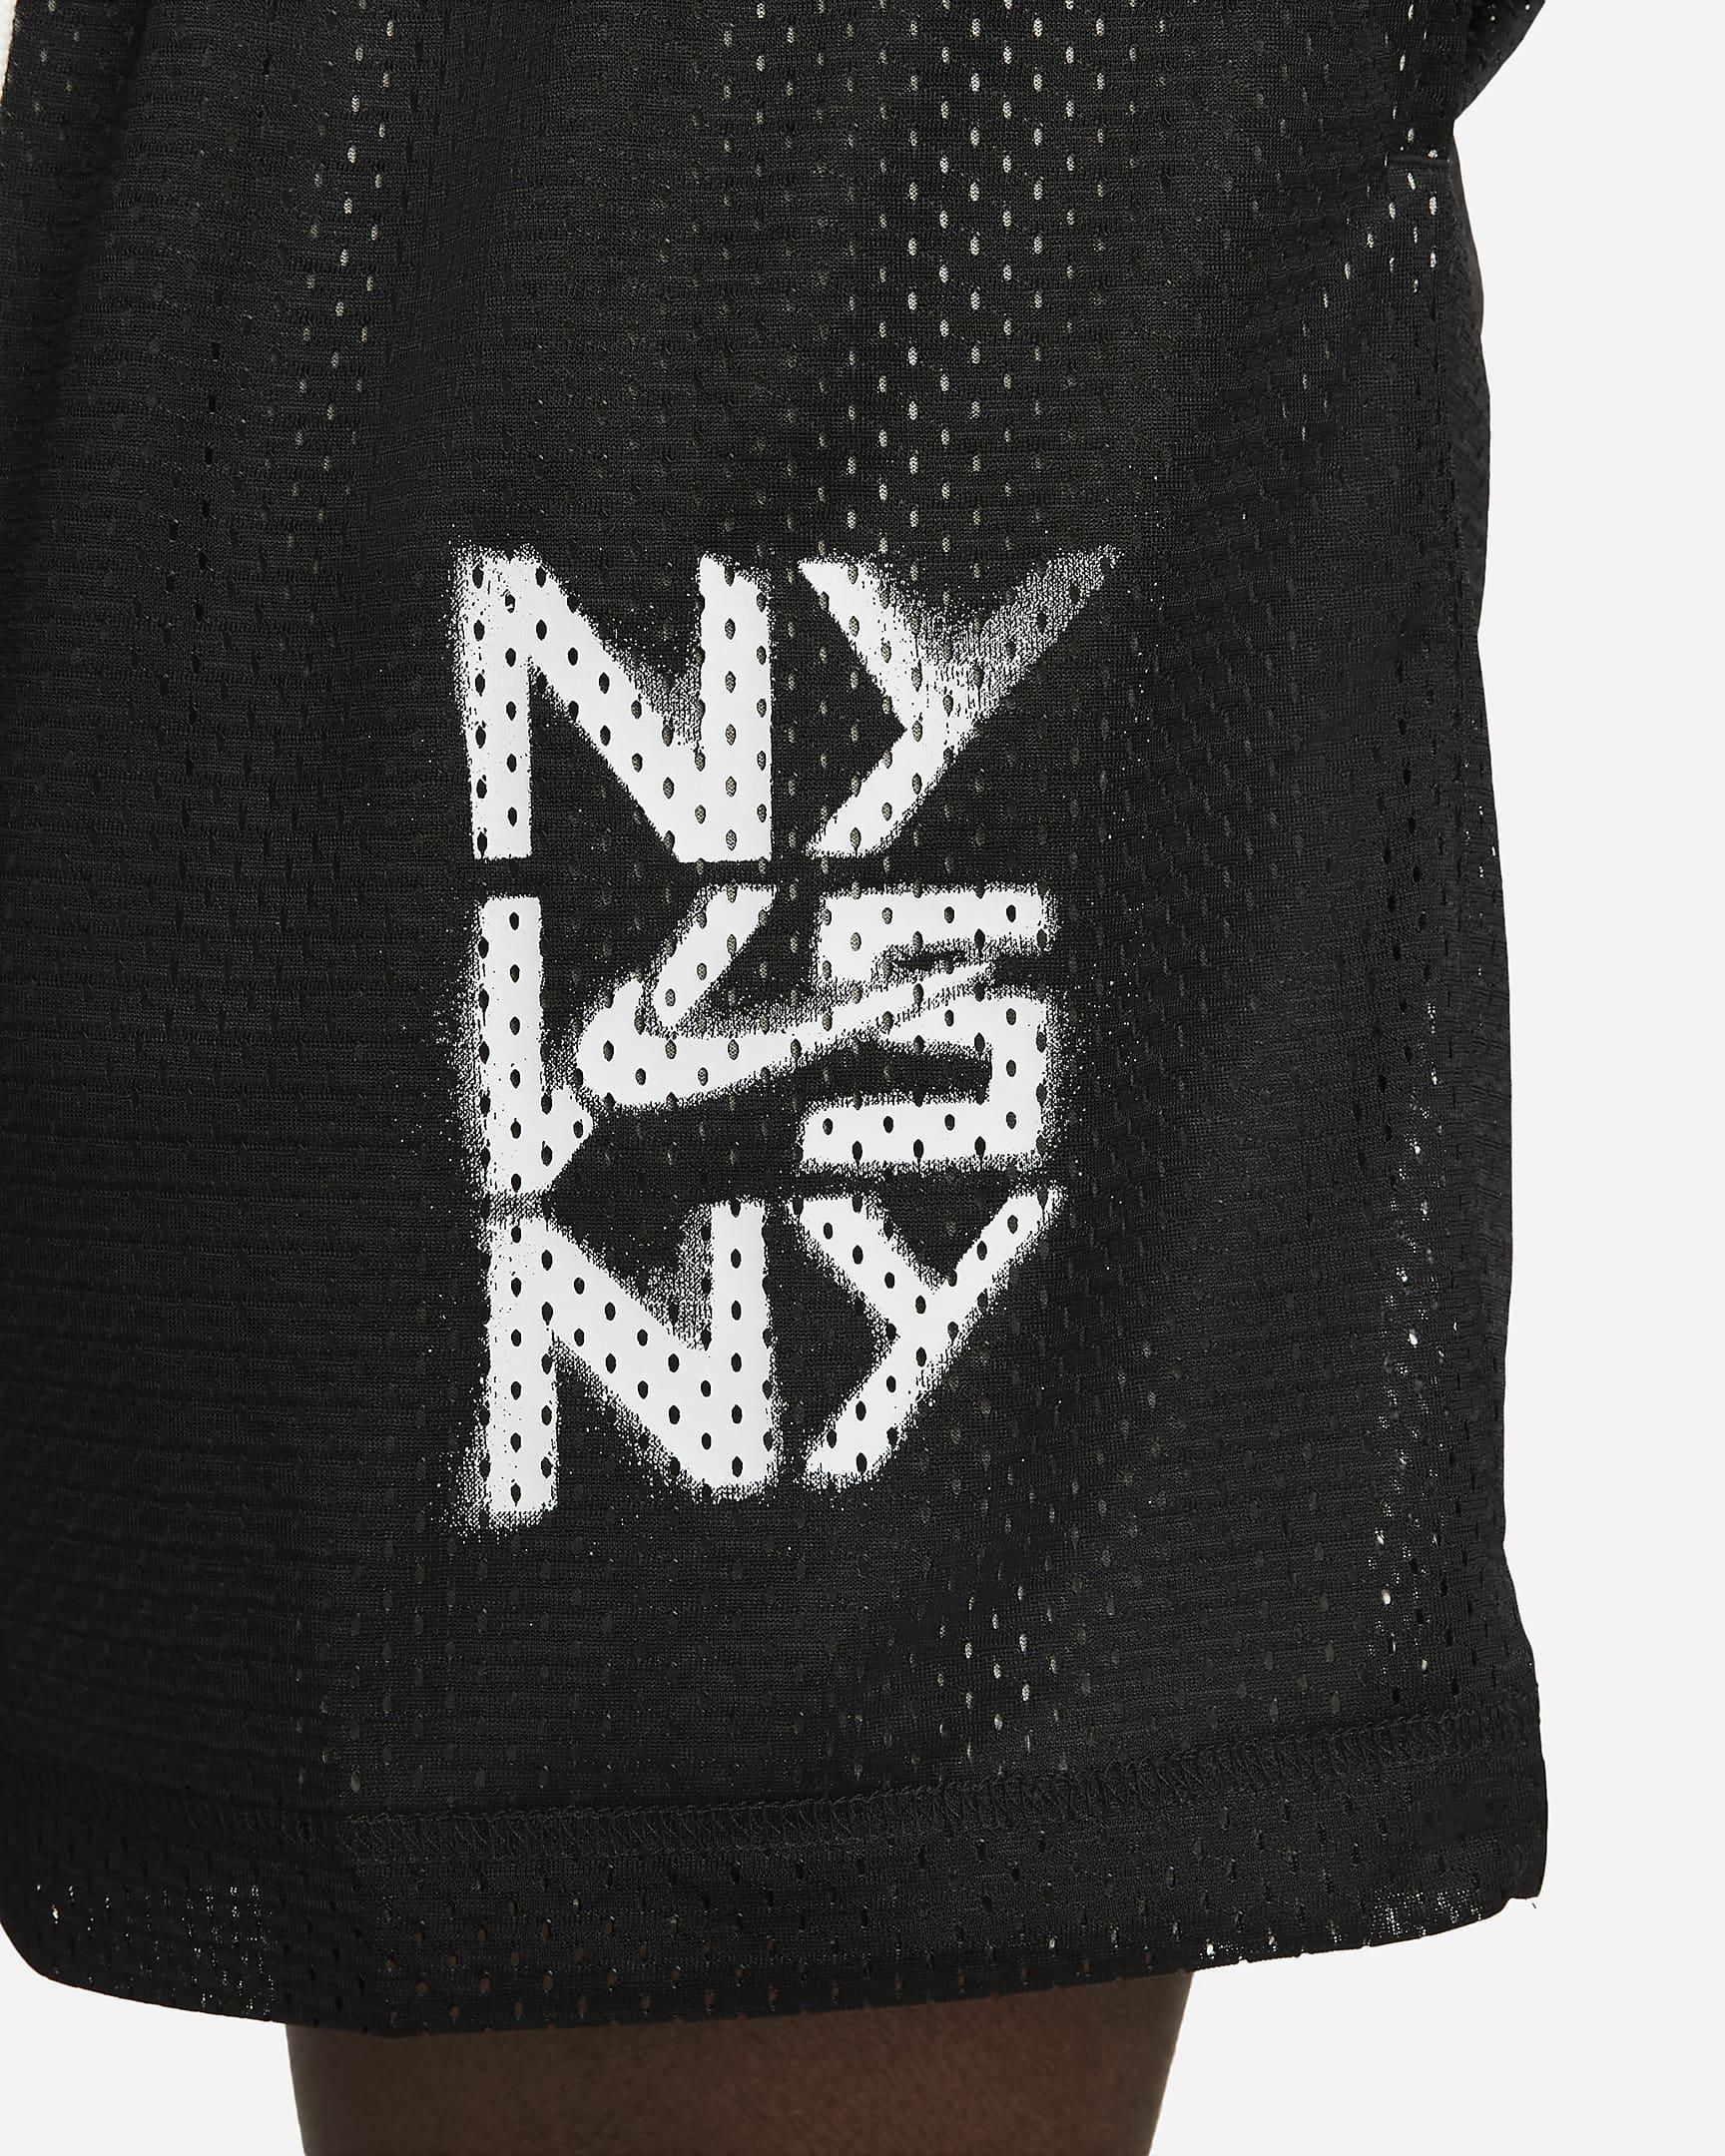 standard-issue-ny-vs-ny-mens-reversible-basketball-shorts-dmtNTl-2.png